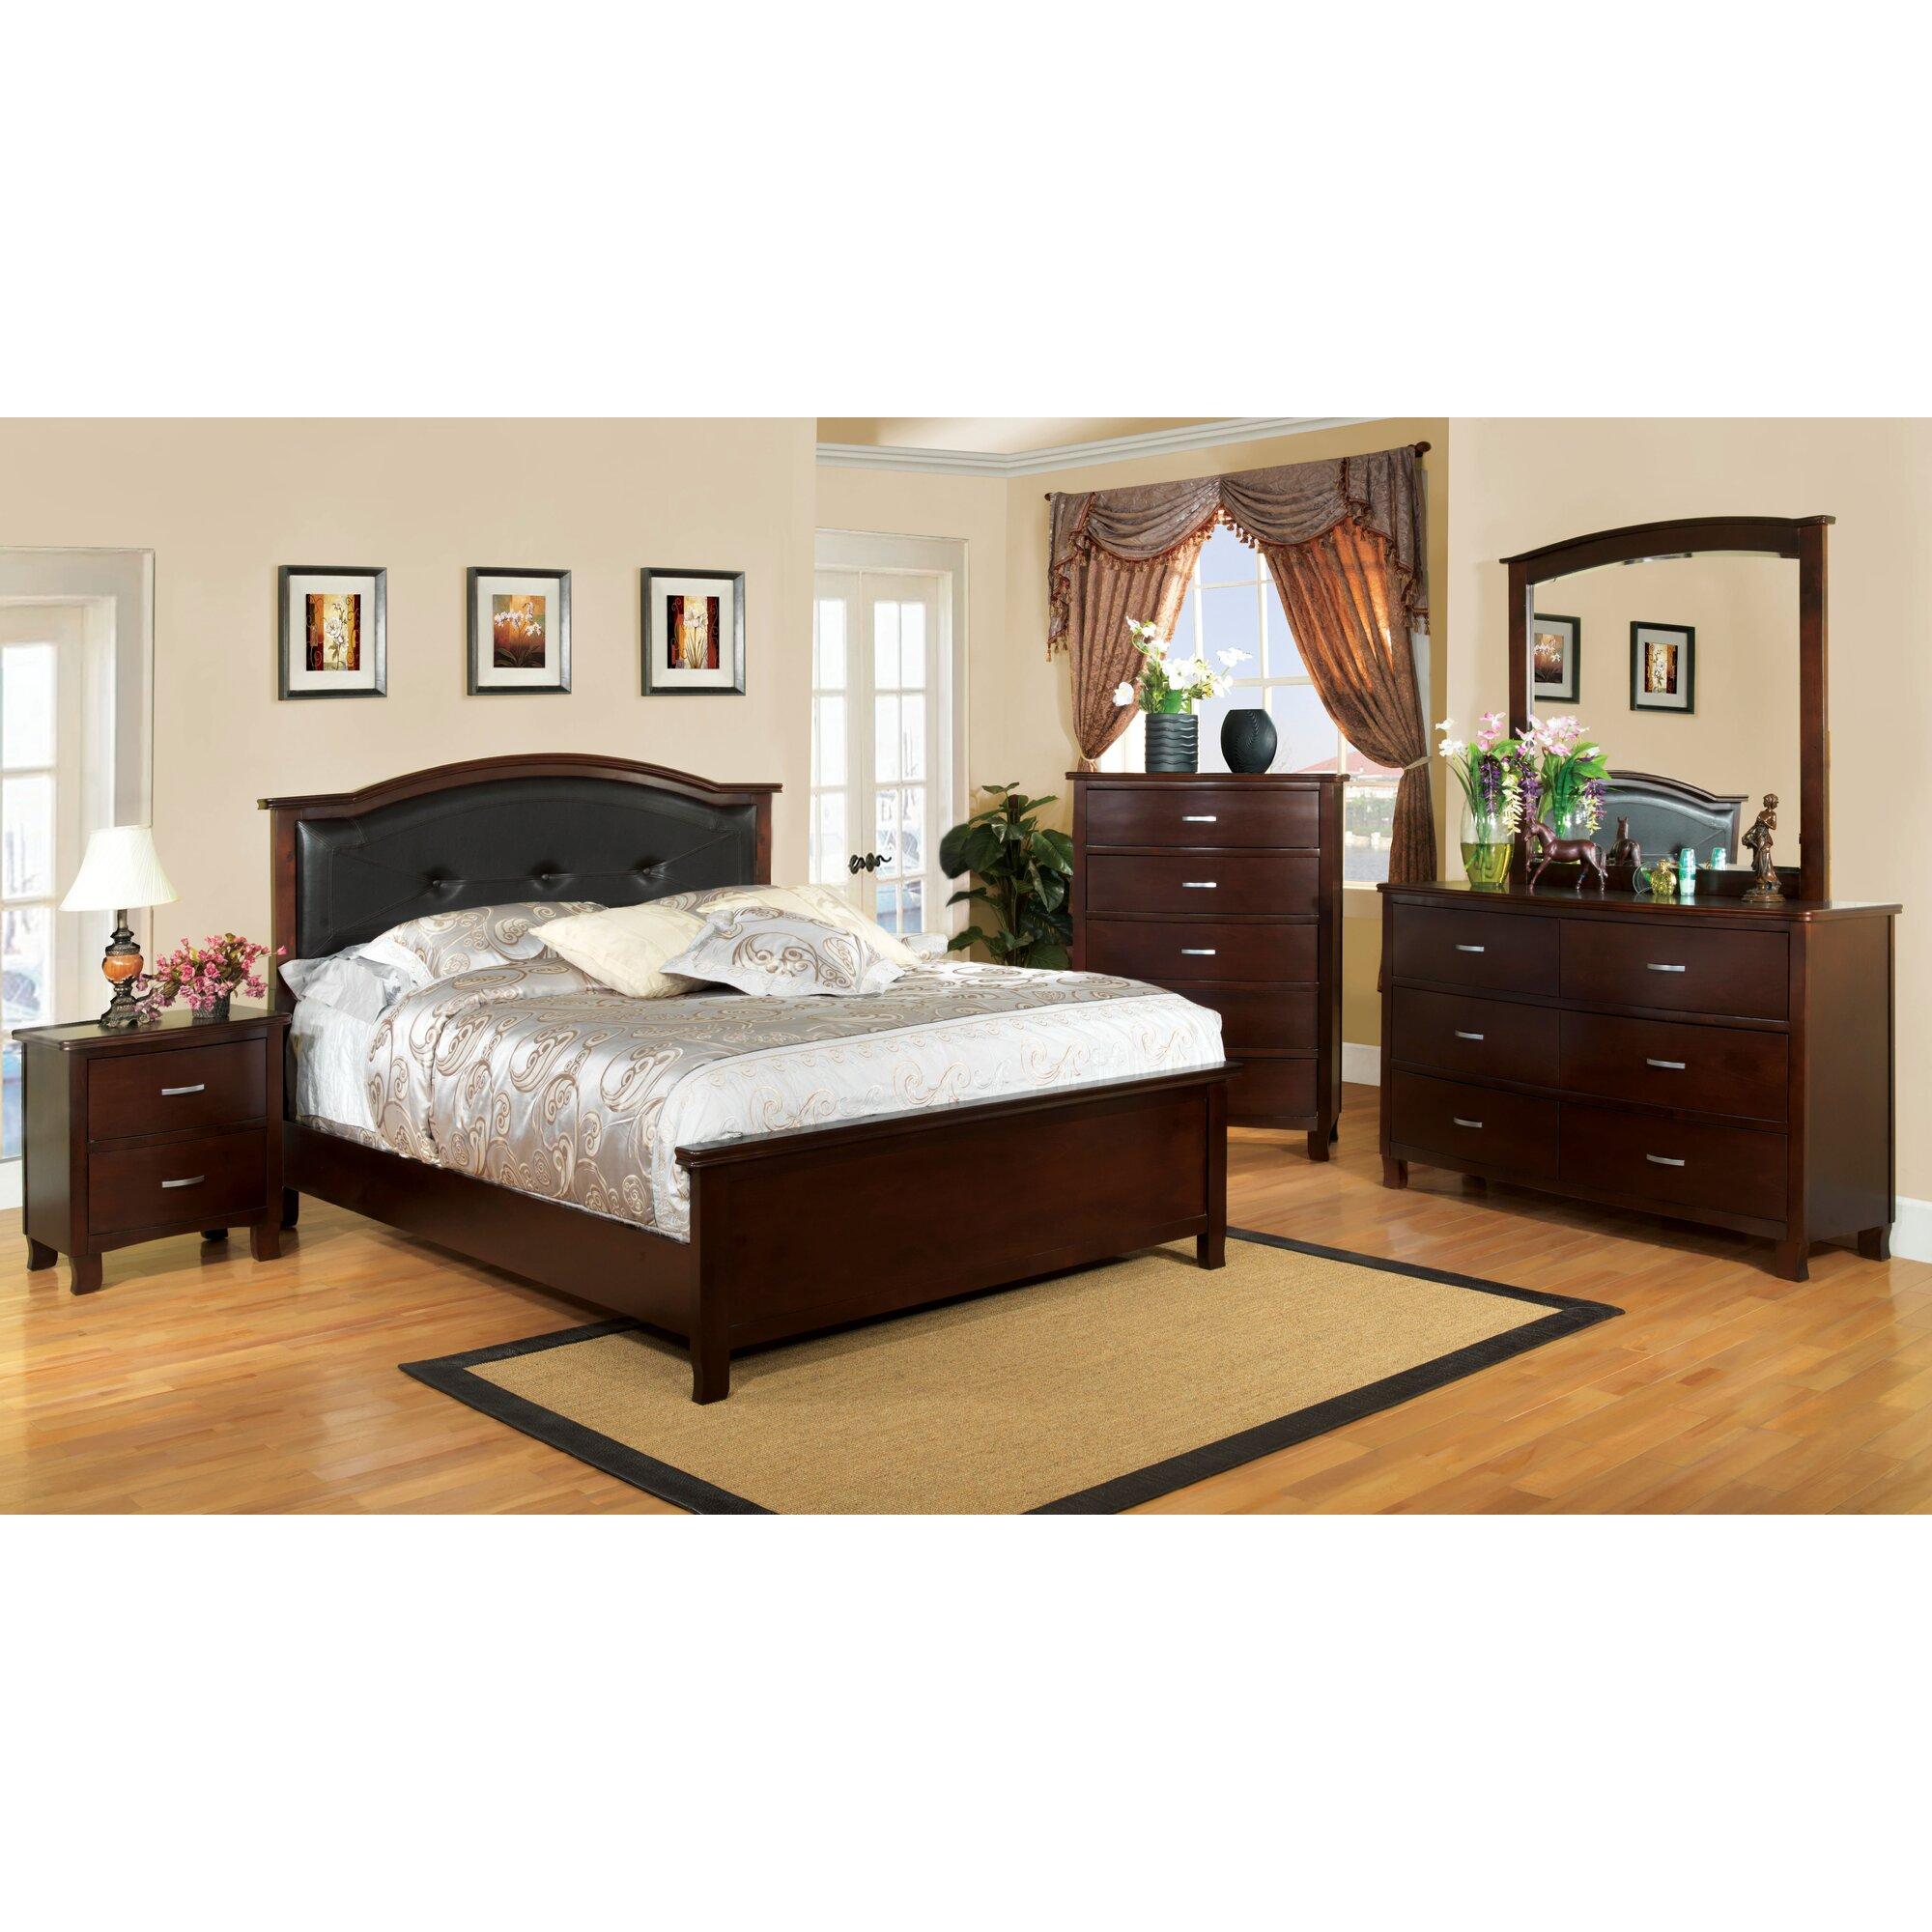 Hokku designs preston panel customizable bedroom set reviews wayfair Bedroom furniture preston